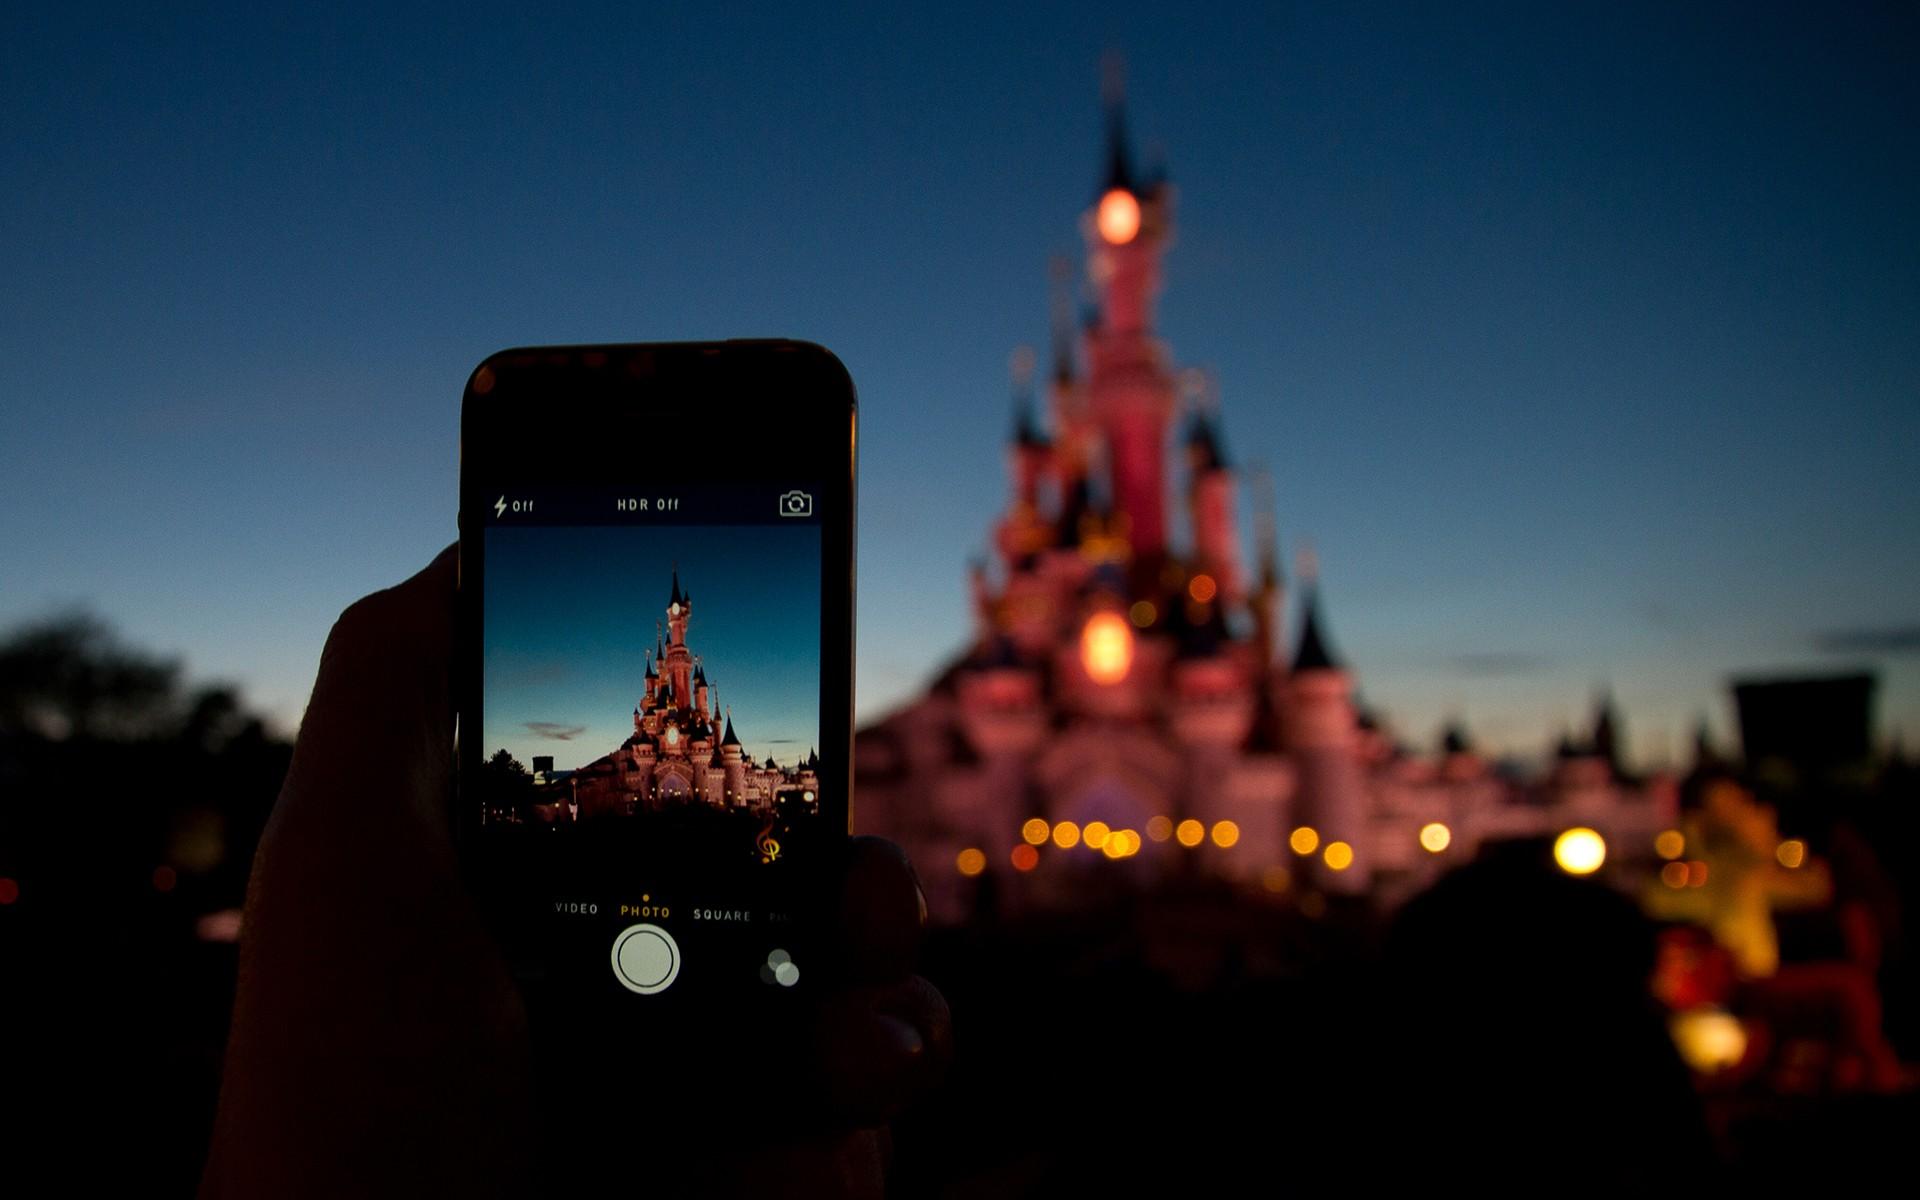 General 1920x1200 Disney castle phone cellphone bokeh